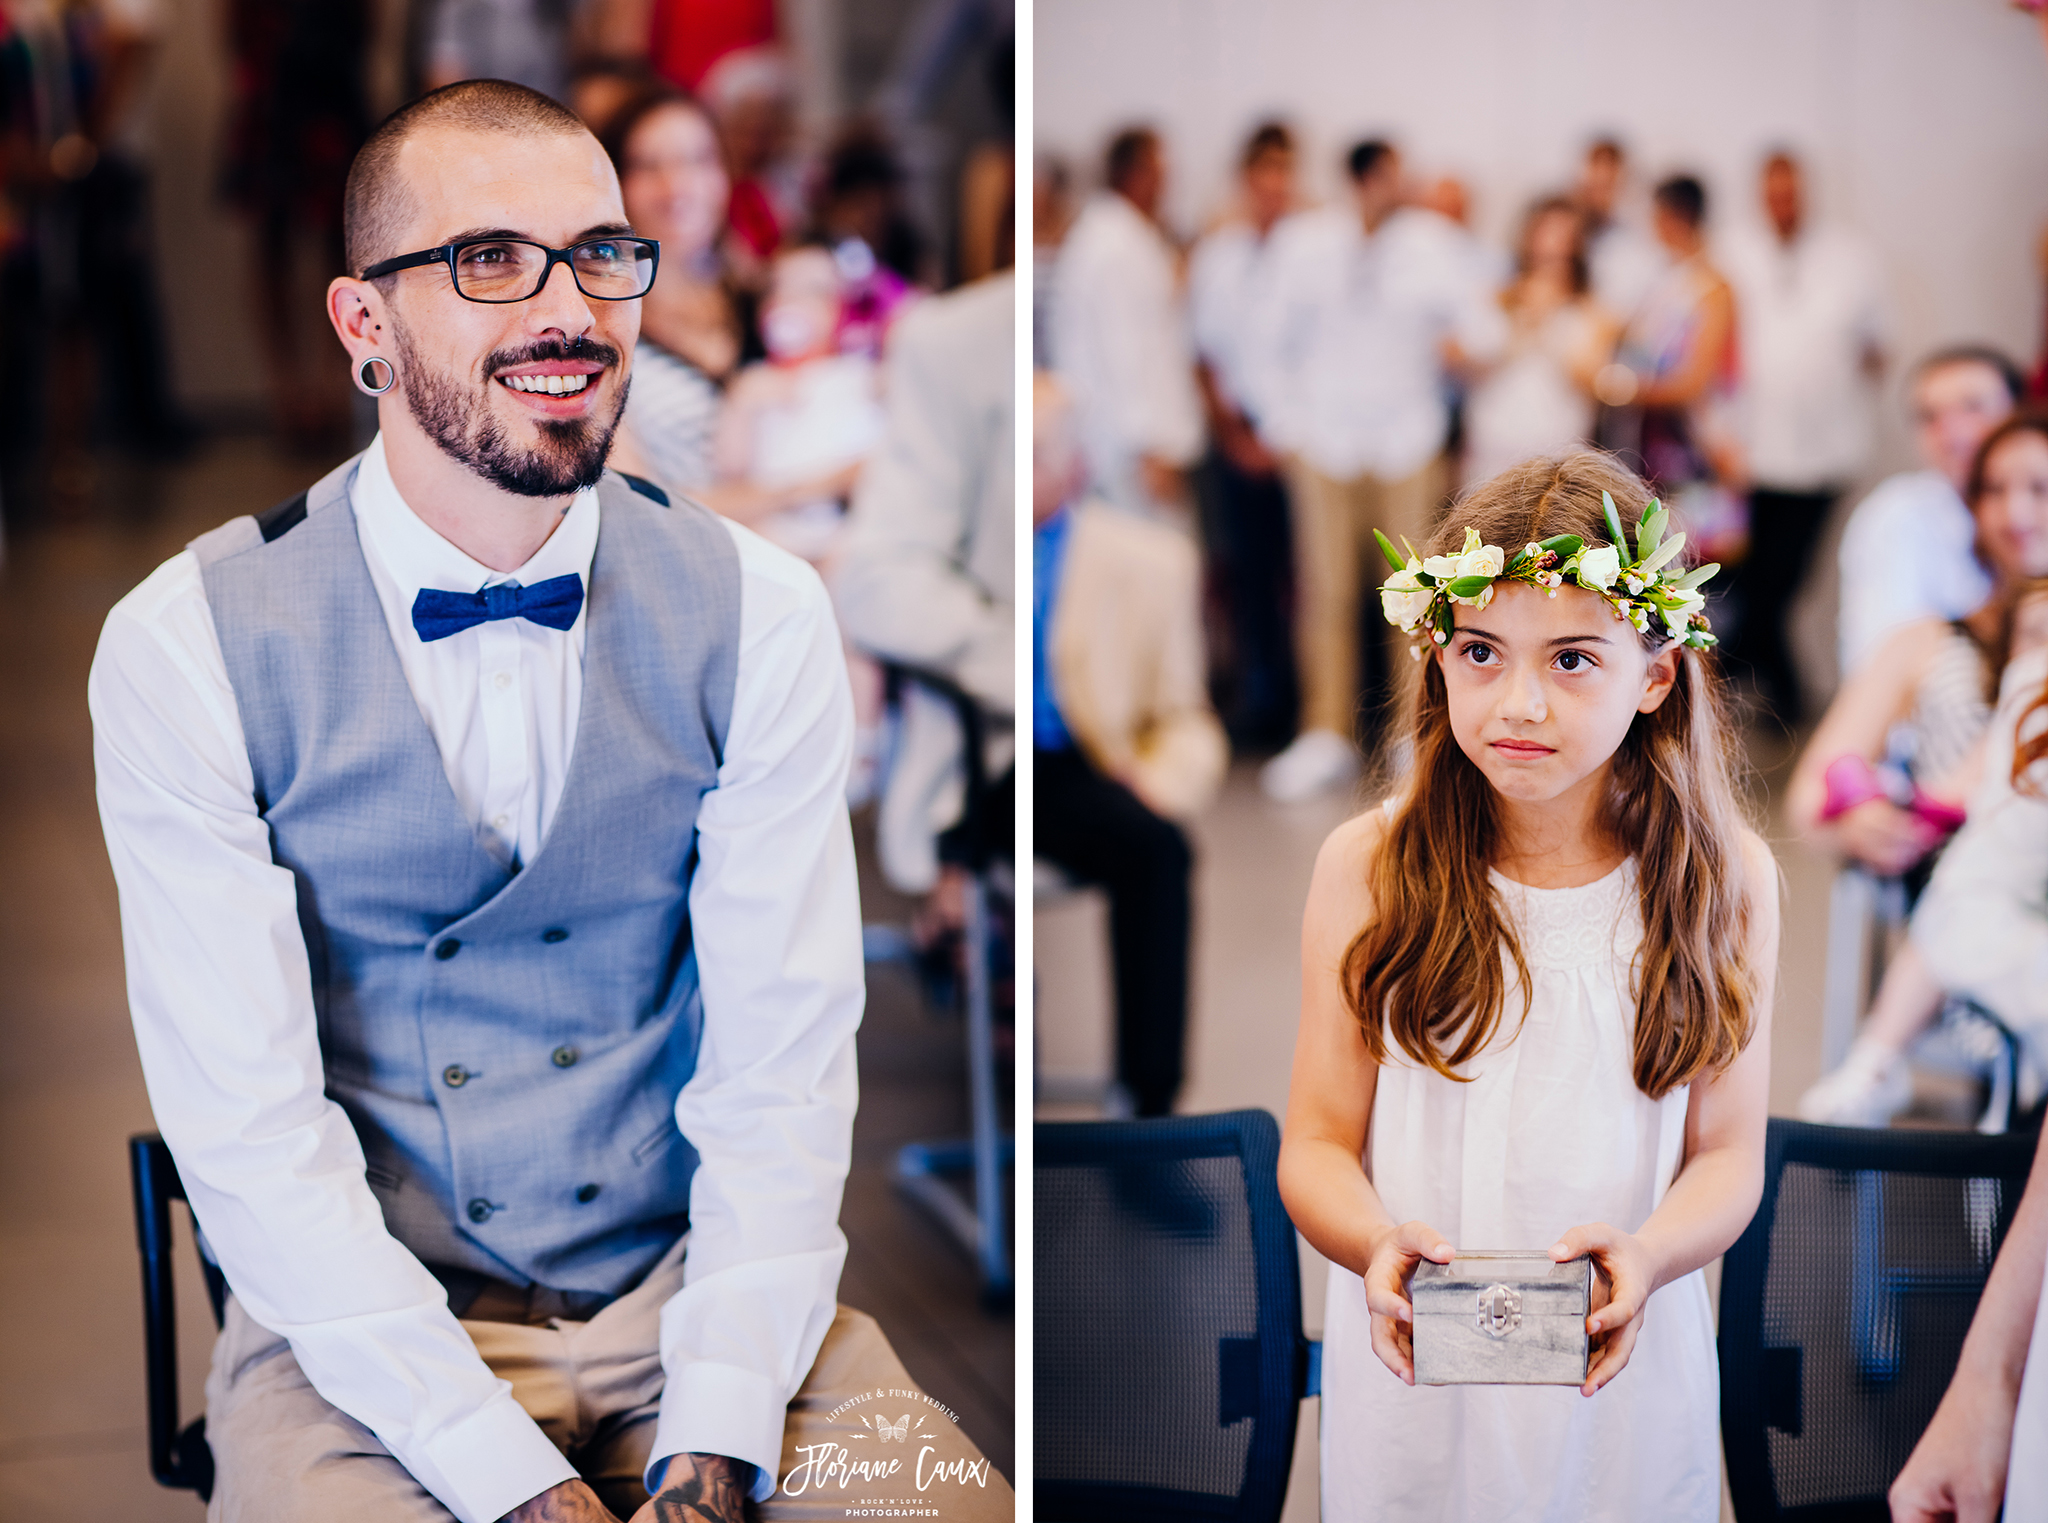 photographe-mariage-toulouse-rocknroll-maries-tatoues-floriane-caux-32